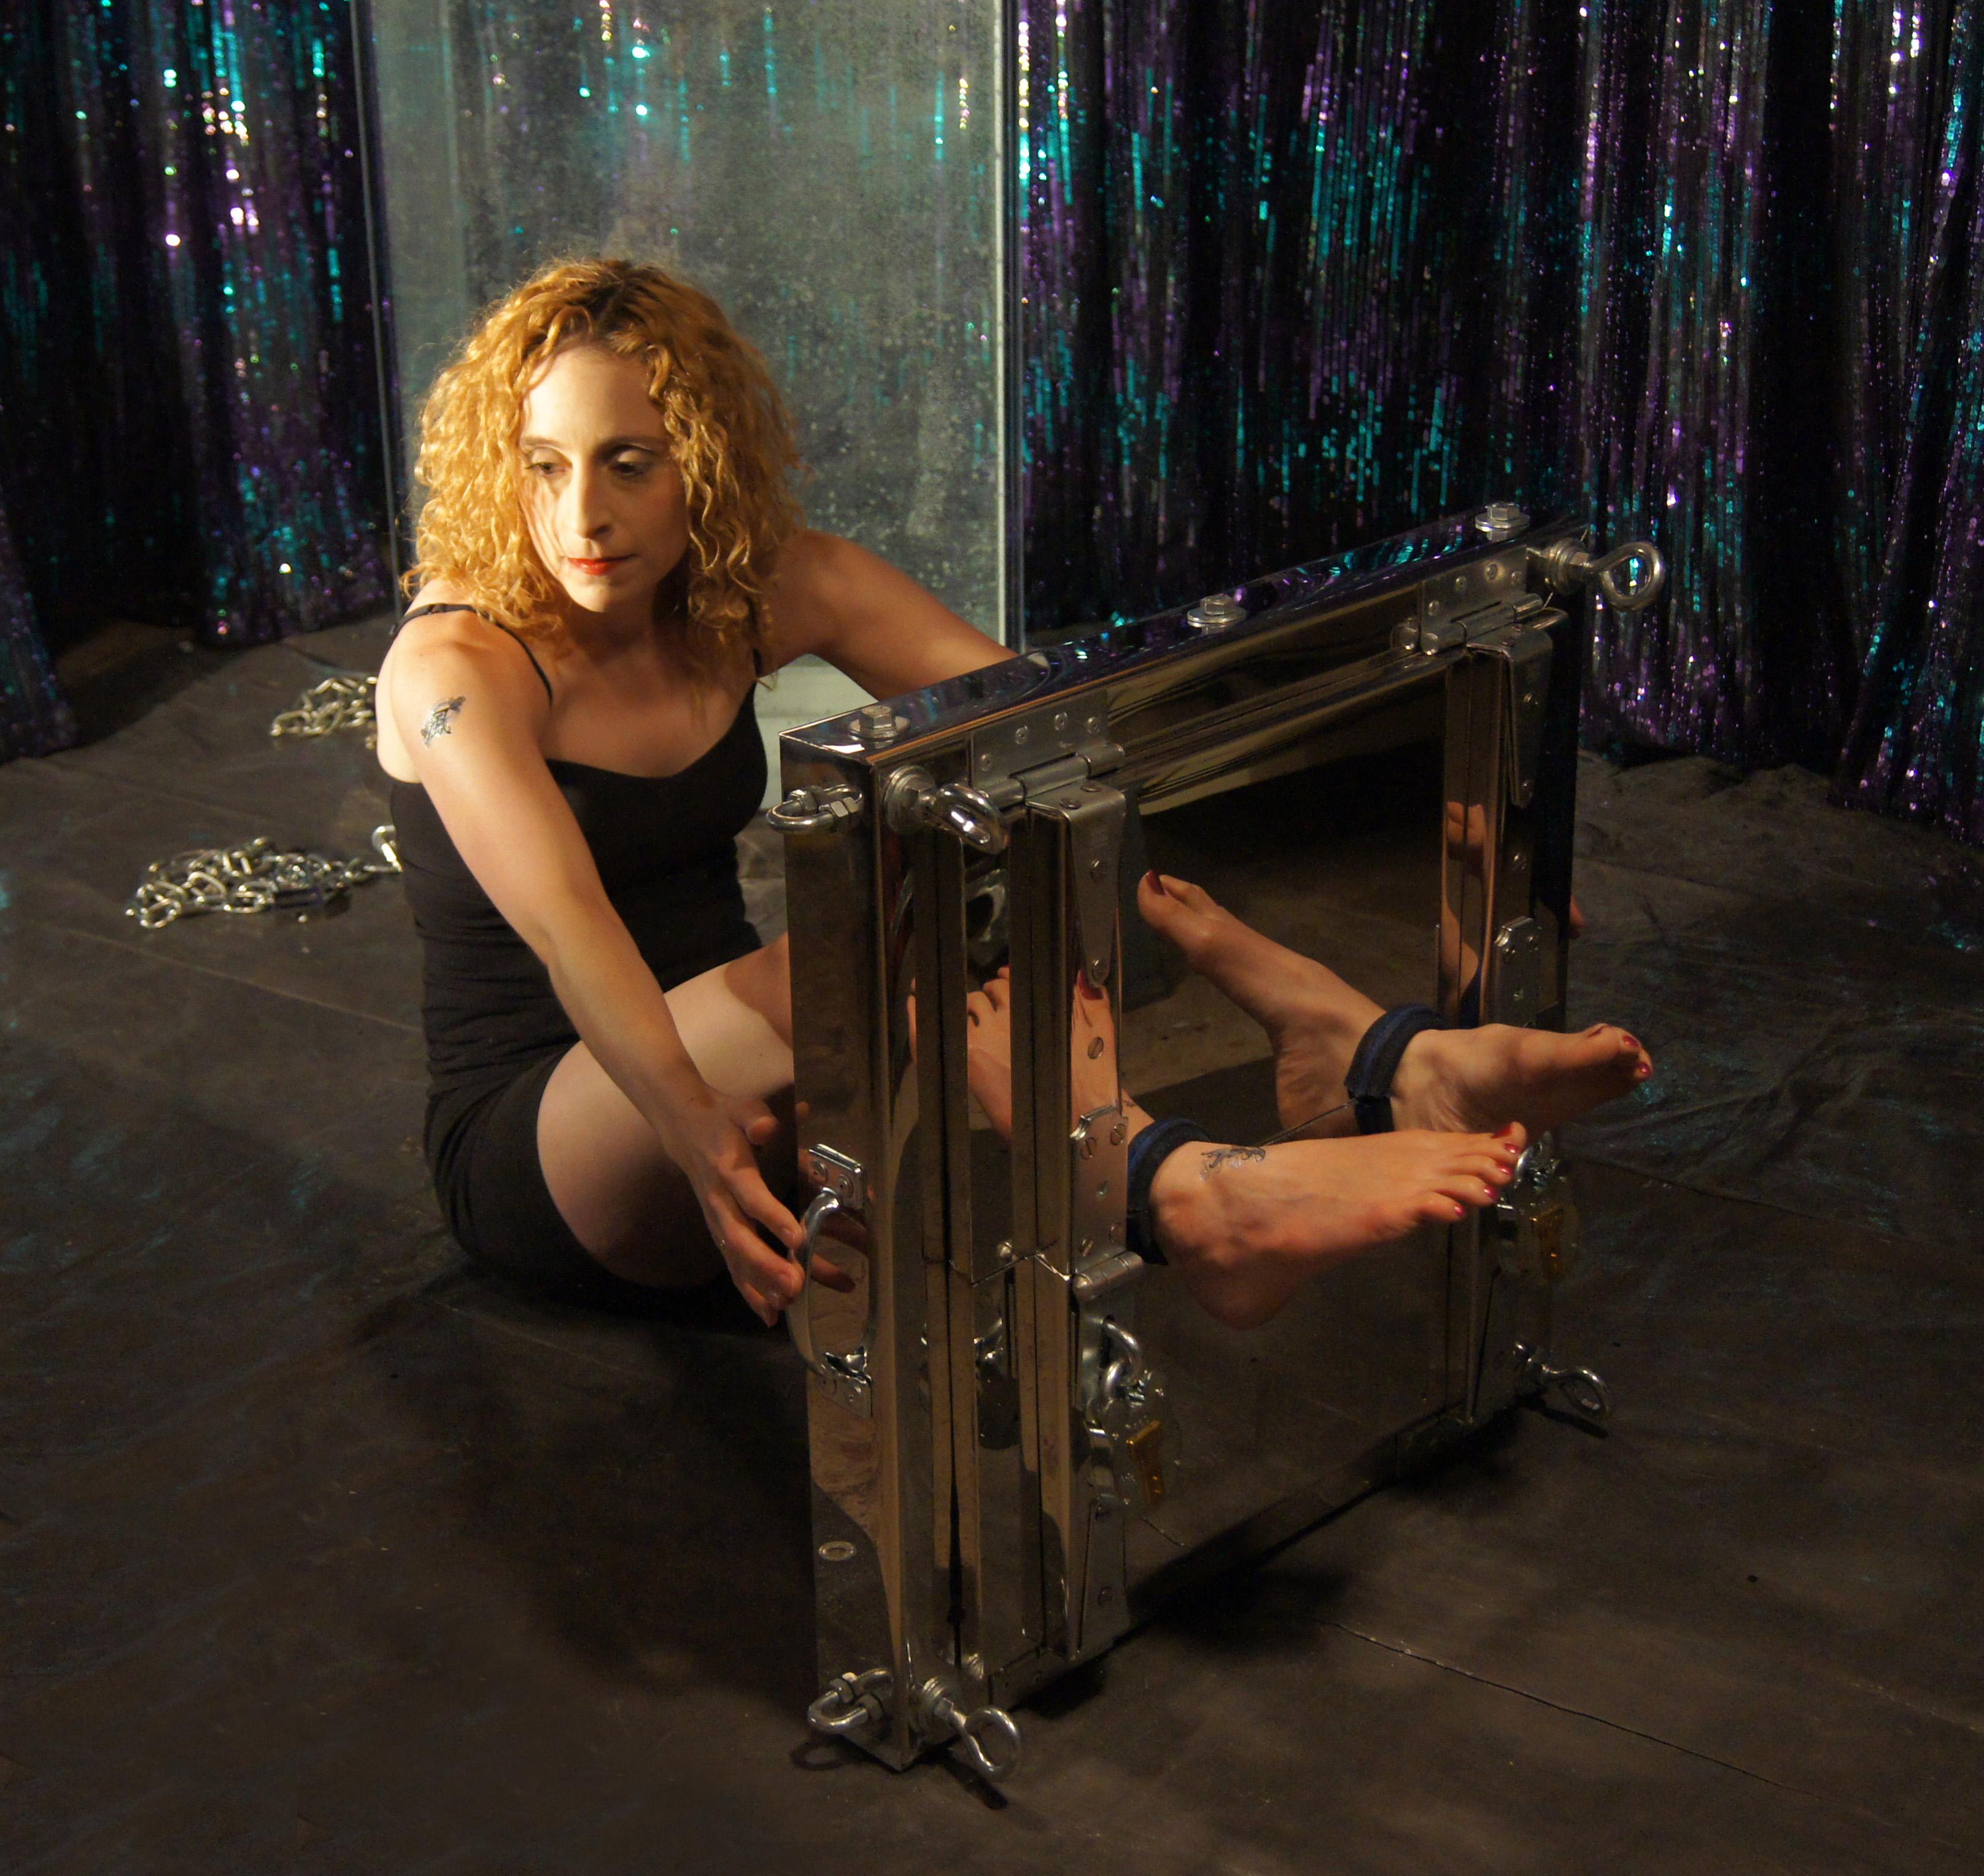 Torture rack girl sex clip